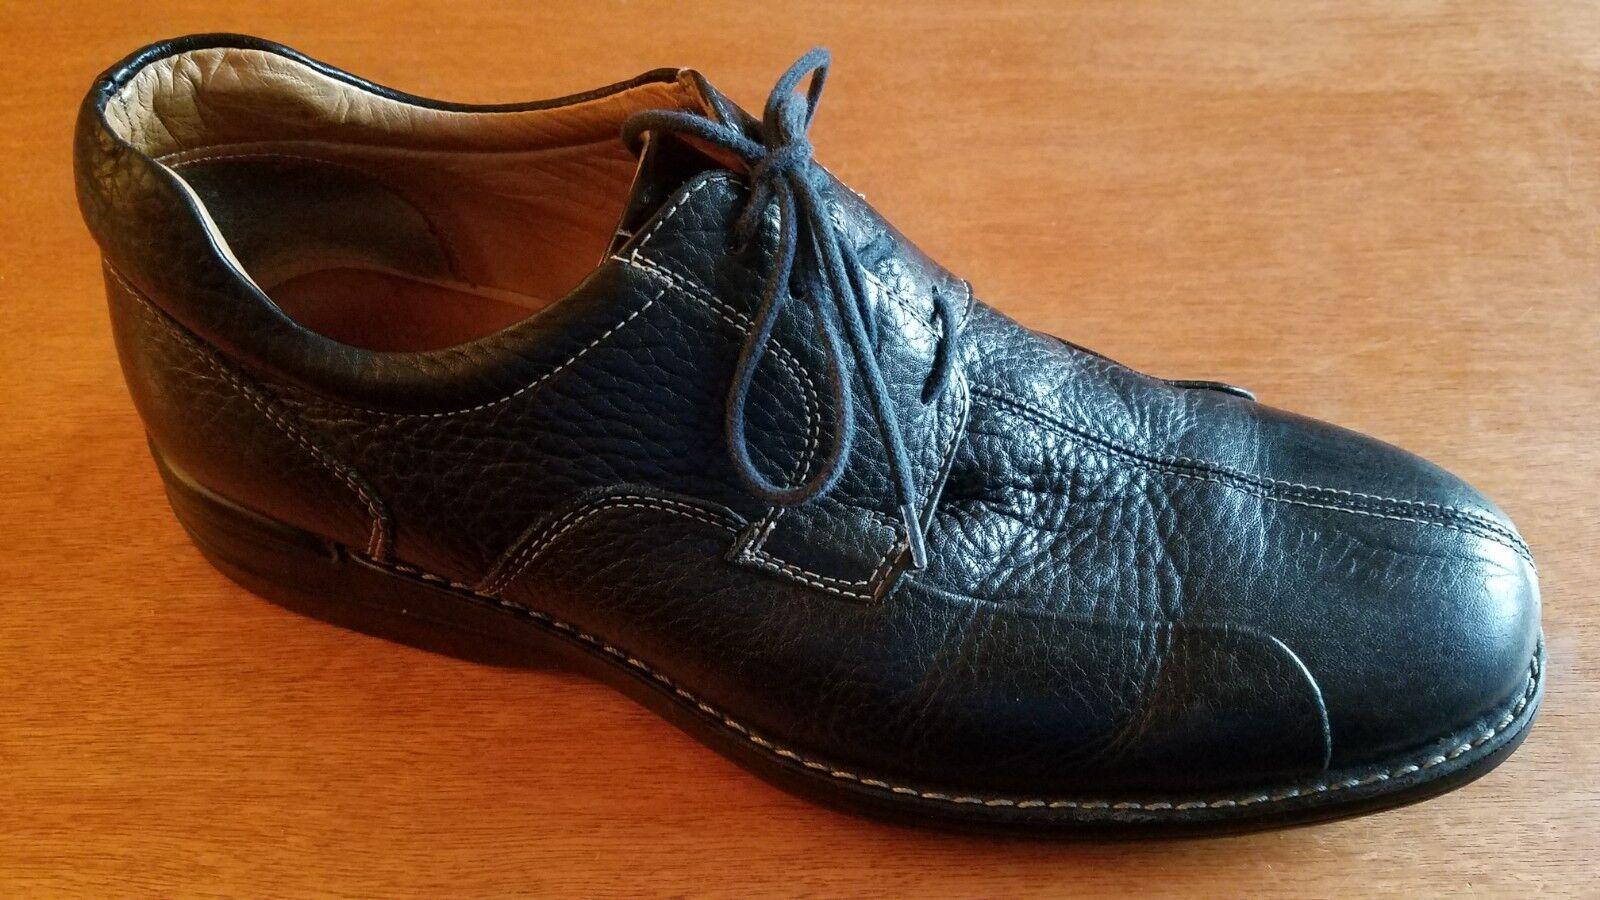 JOHNSTON & MURPHY Mens Size  Black Sheepskin Leather Lace Up Oxford shoes  10.5M